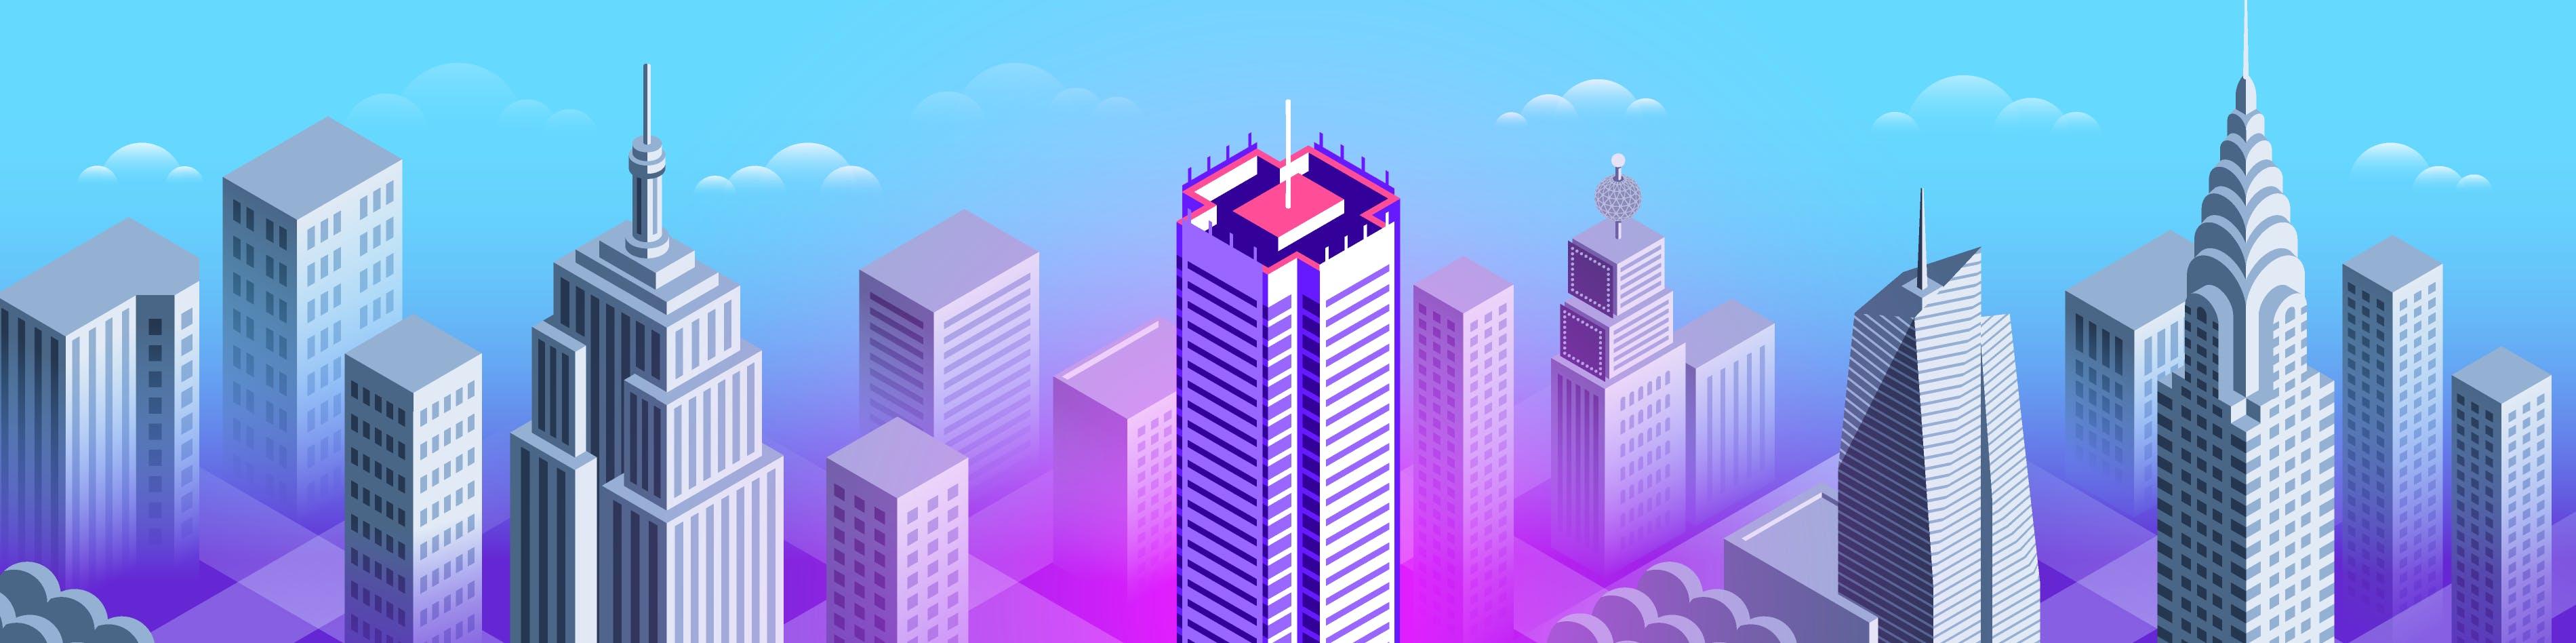 careers/datadog_office_skyline_190503_nyc.png